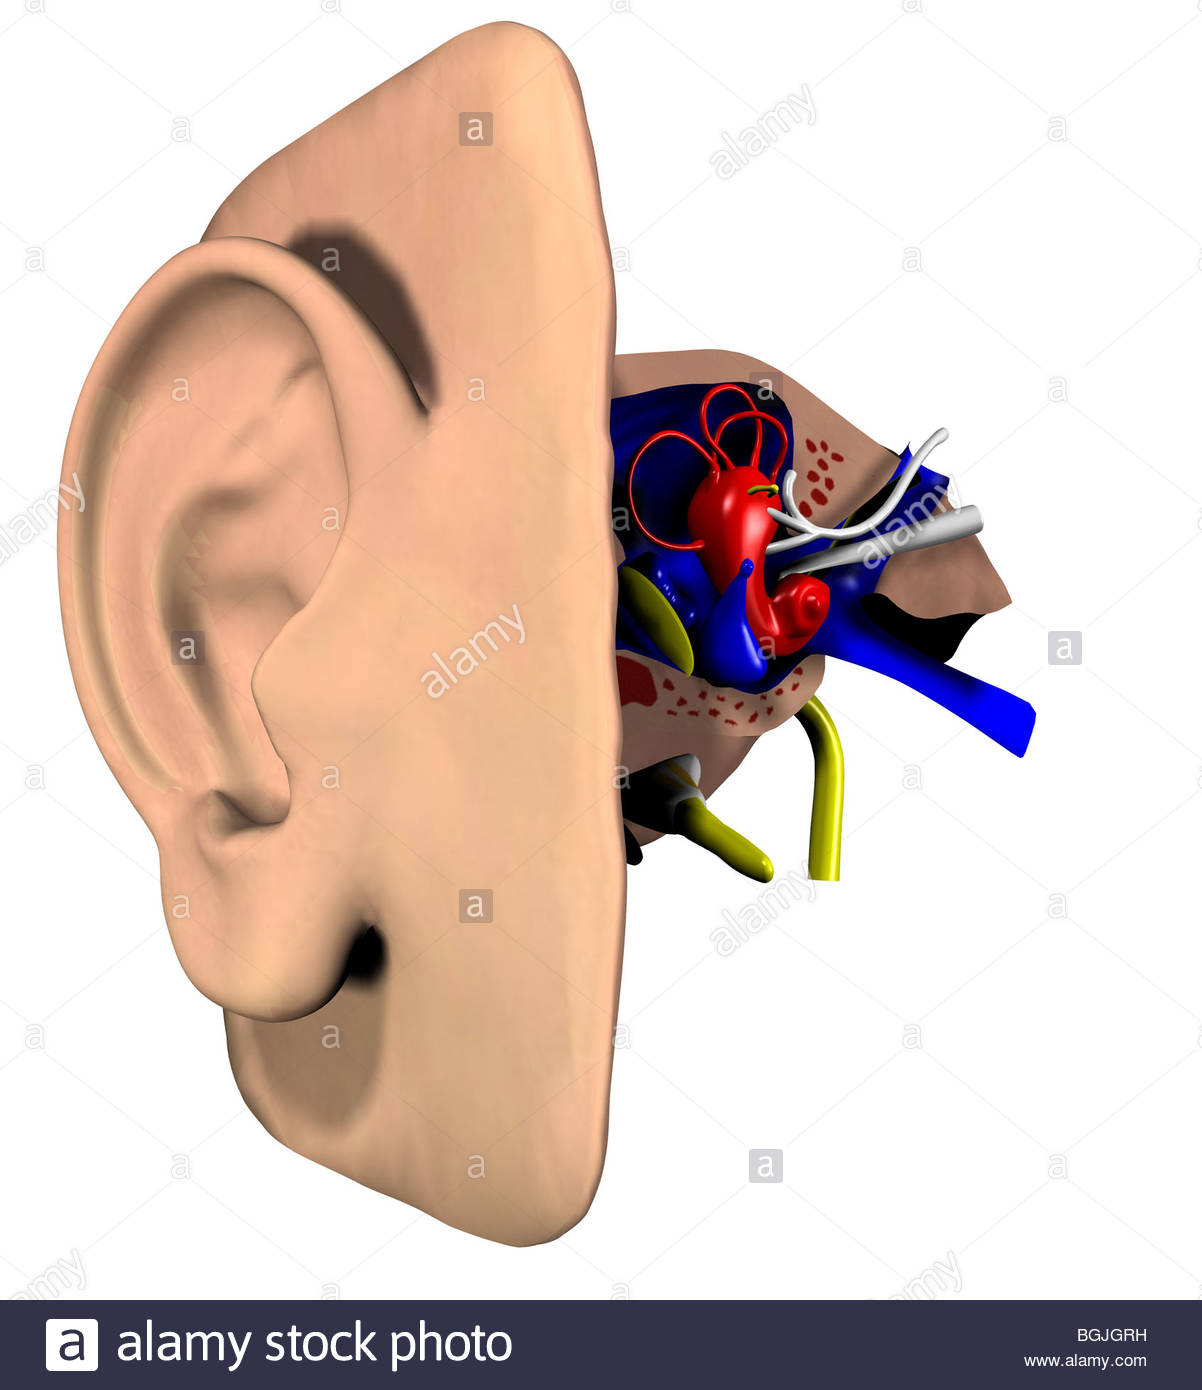 Illustration - Anatomie des Ohres Stockfoto, Bild: 27453205 - Alamy